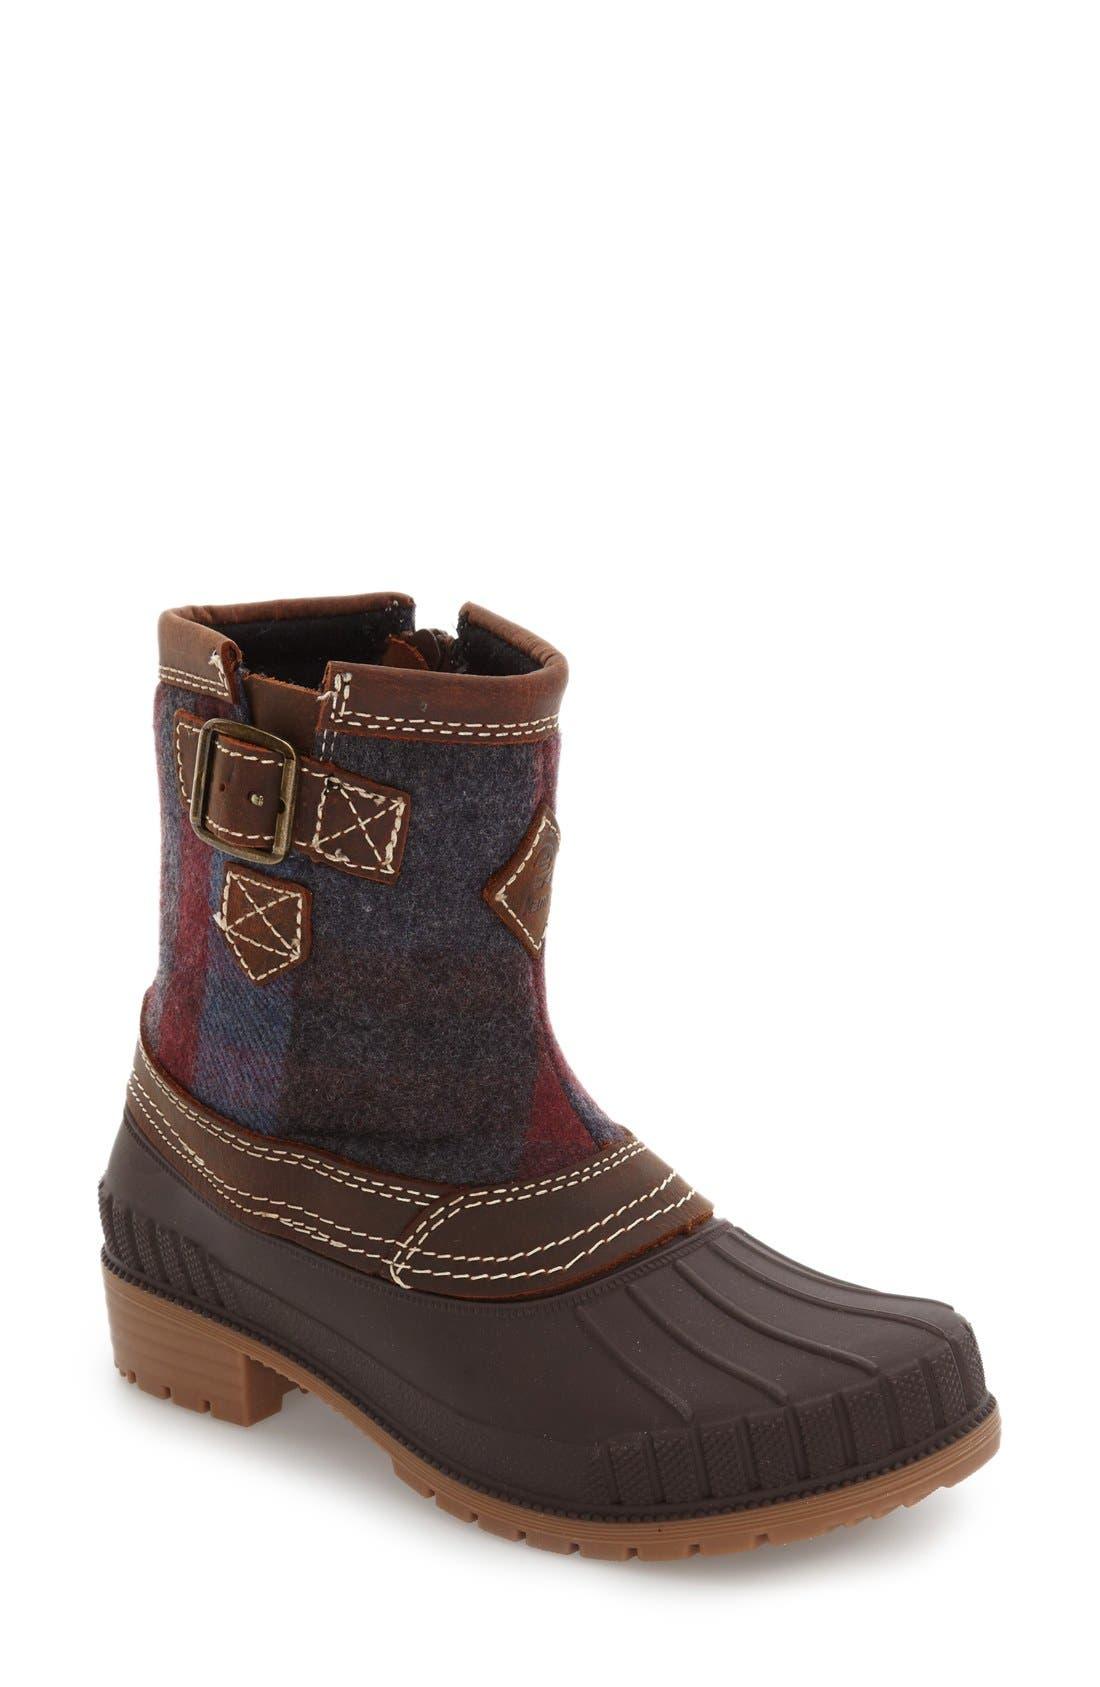 Avelle Waterproof Boot,                         Main,                         color, DARK BROWN LEATHER